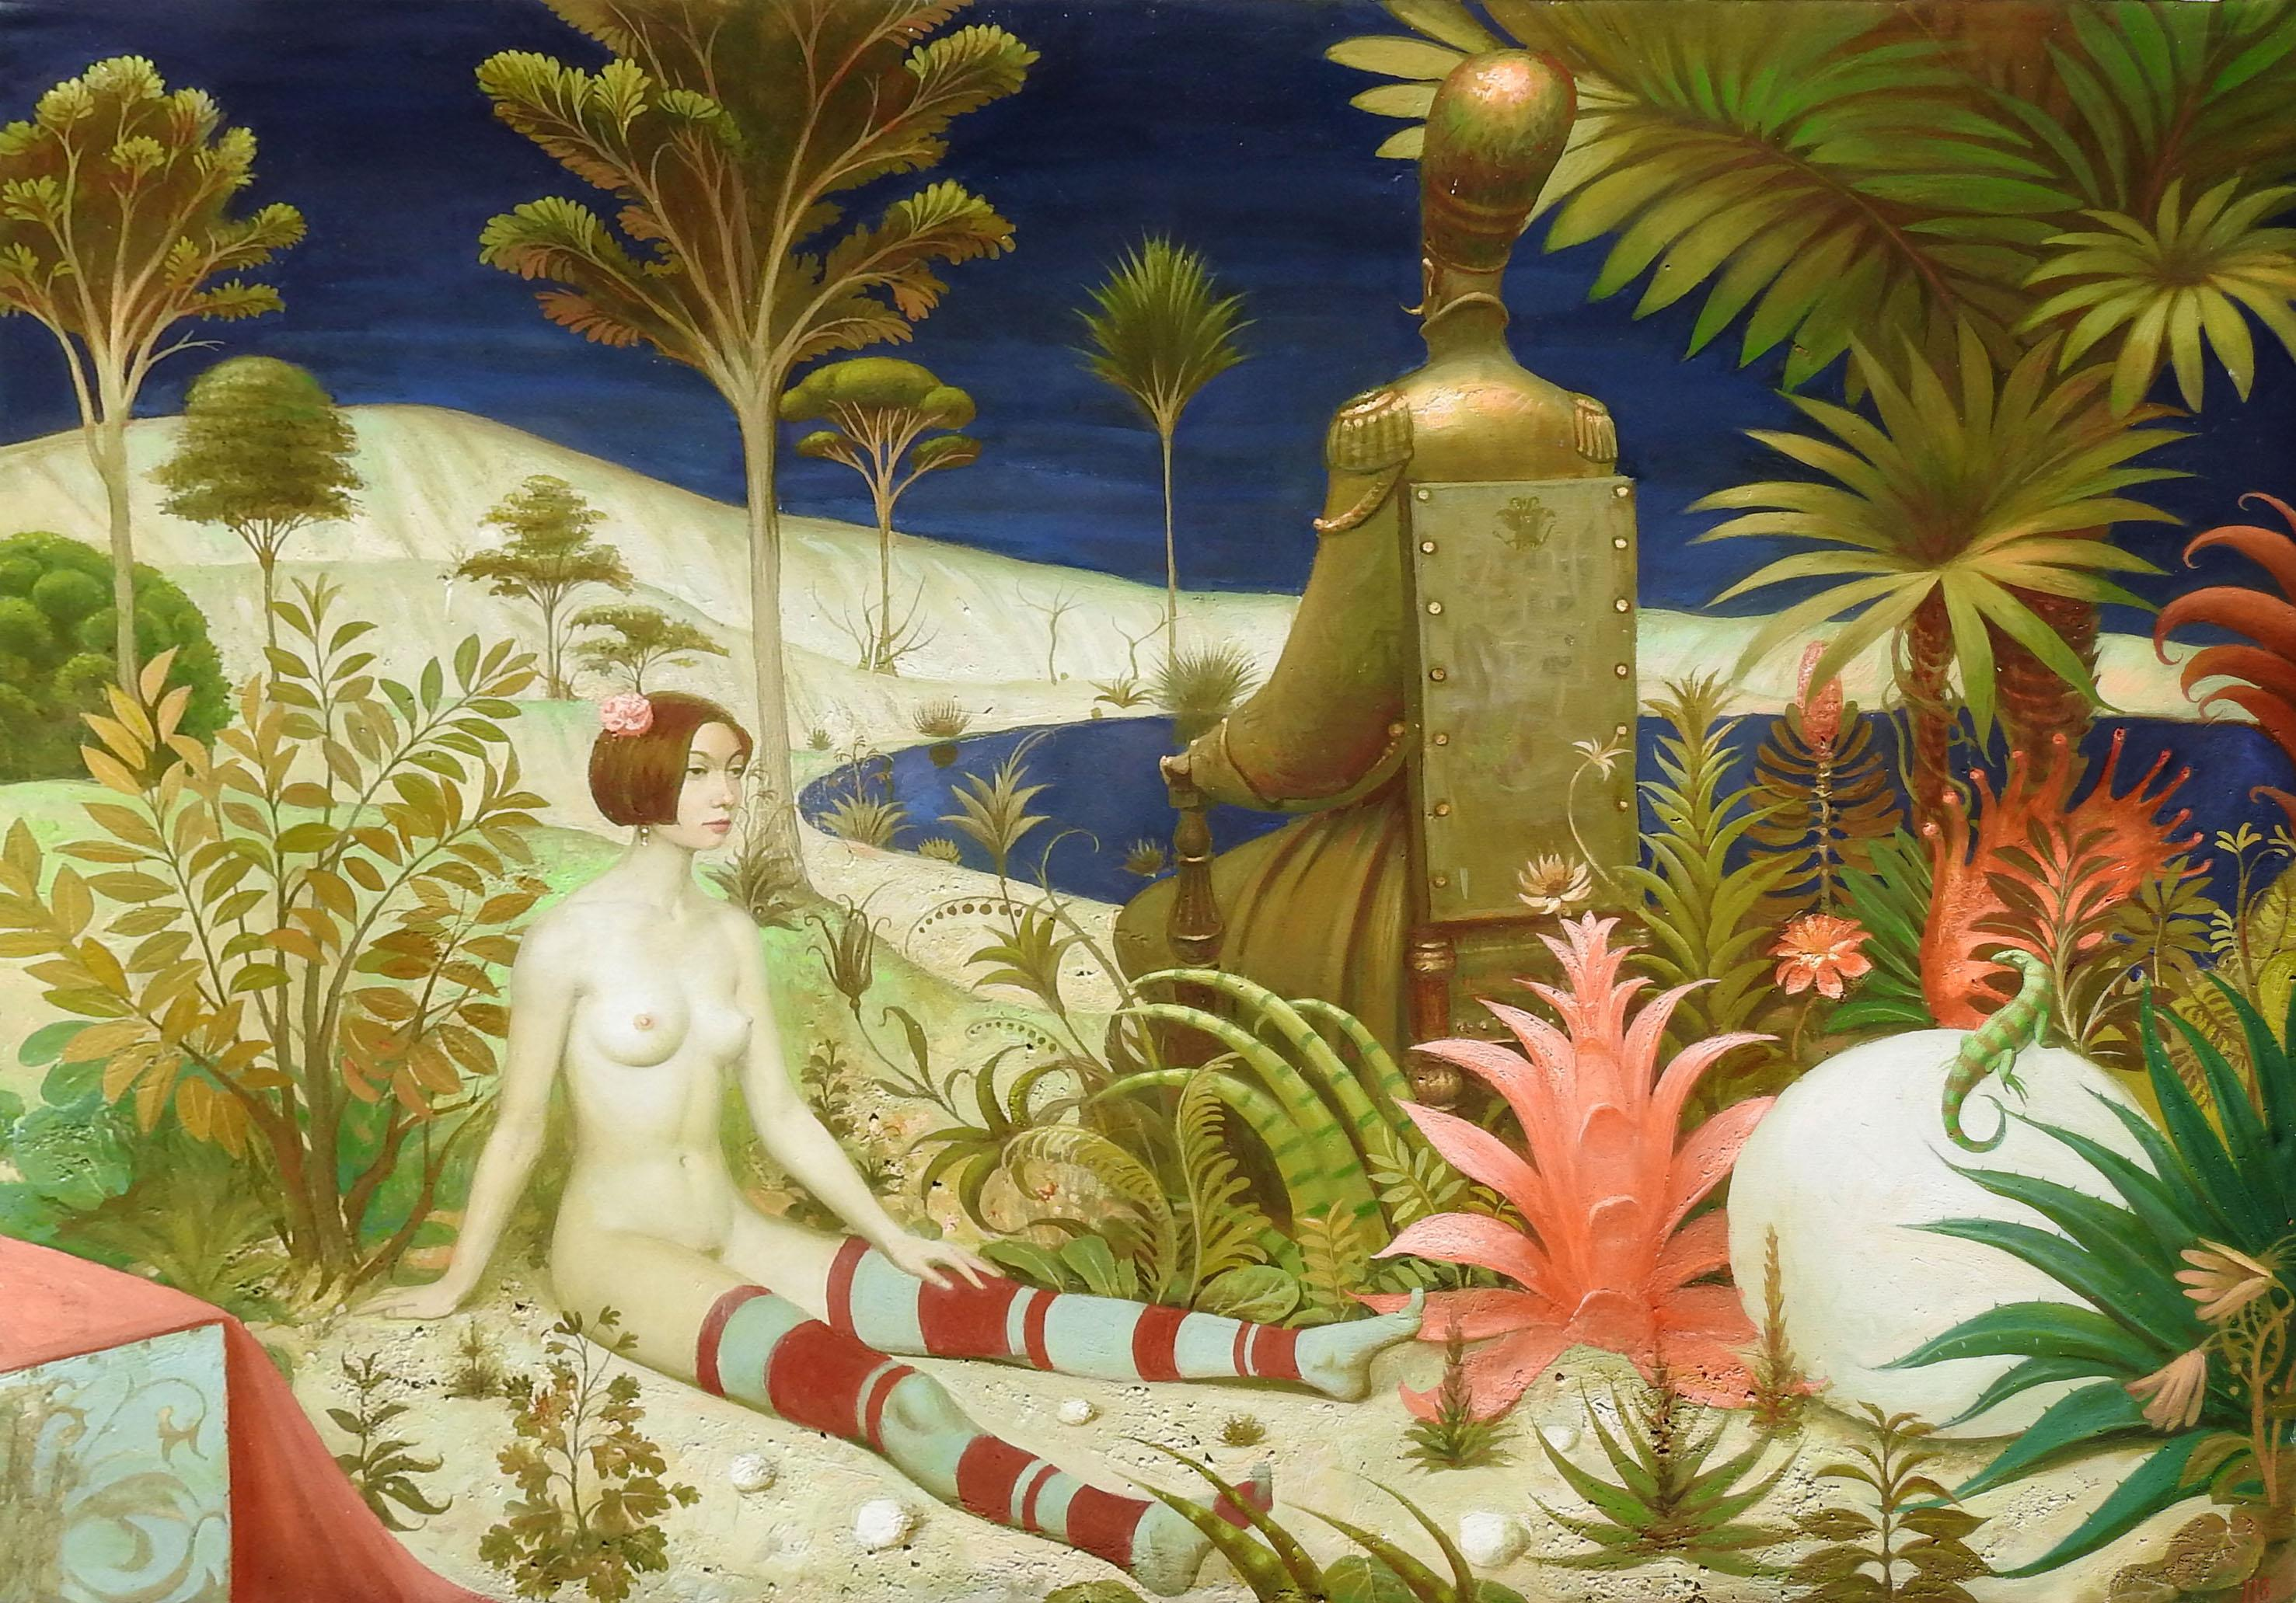 """The Bronze Emperor"", Igor Samsonov, Surrealism, Figurative, Original Oil, 42x53"